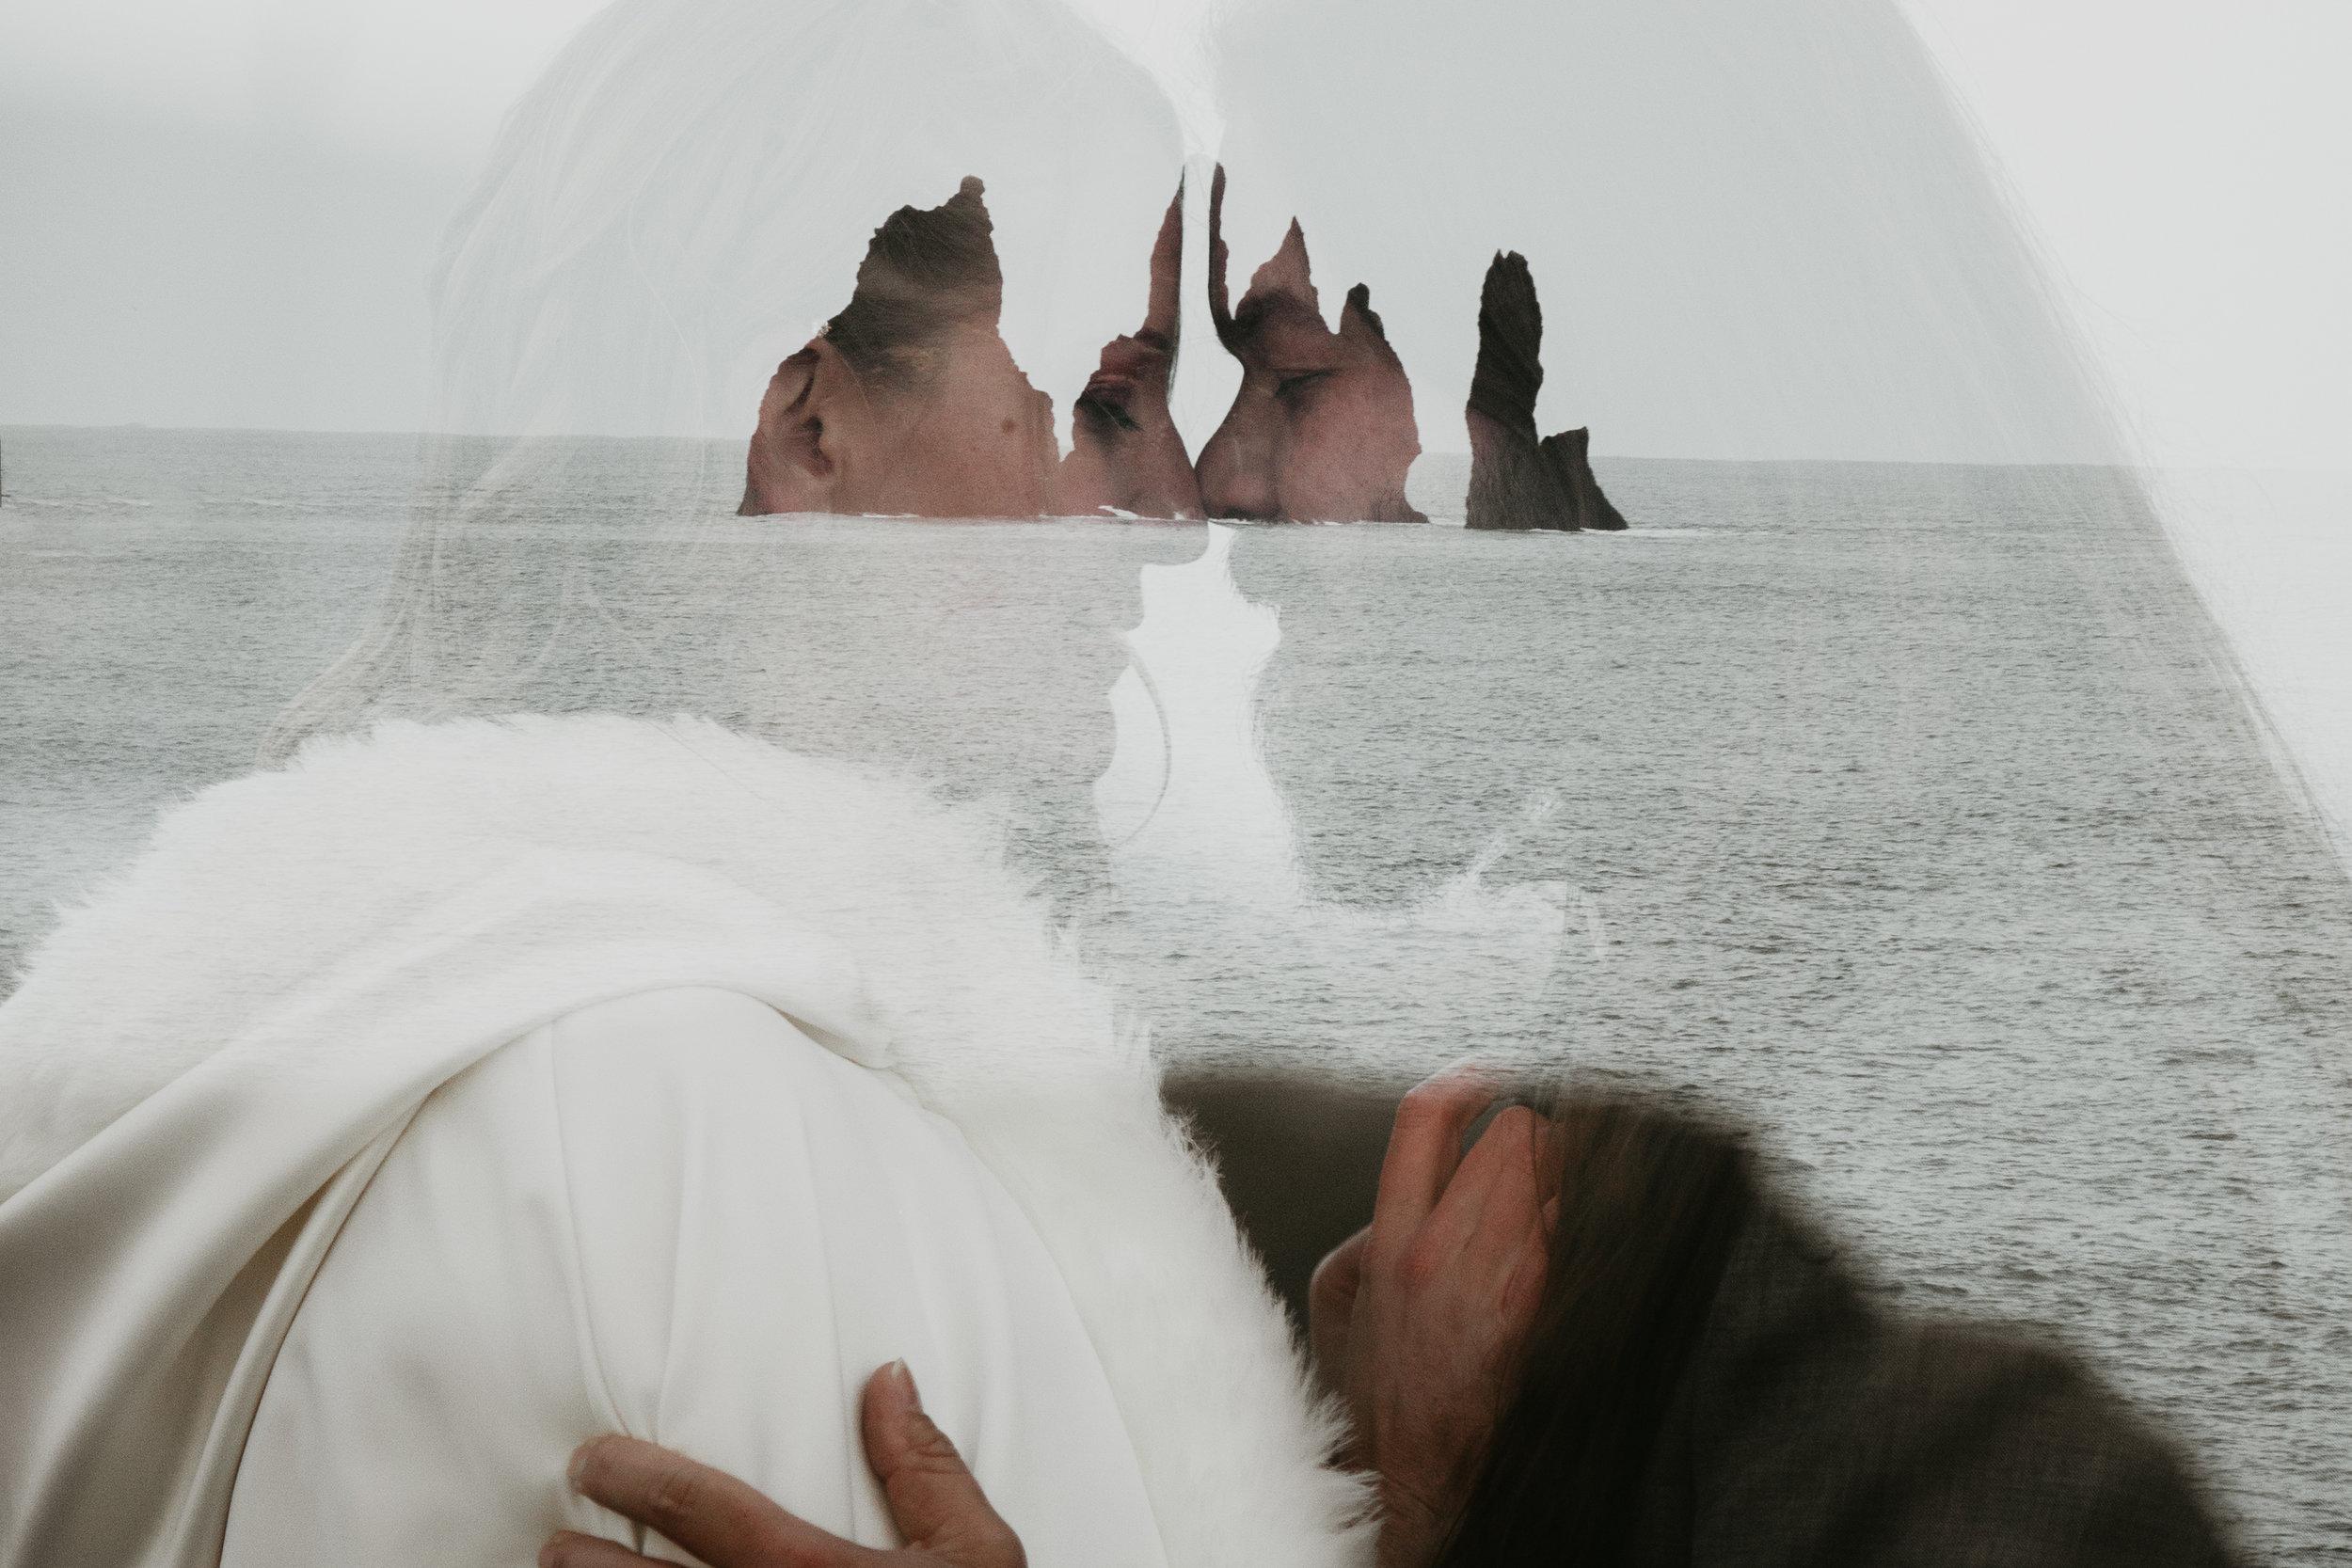 nicole-daacke-photography-Iceland--3.JPG